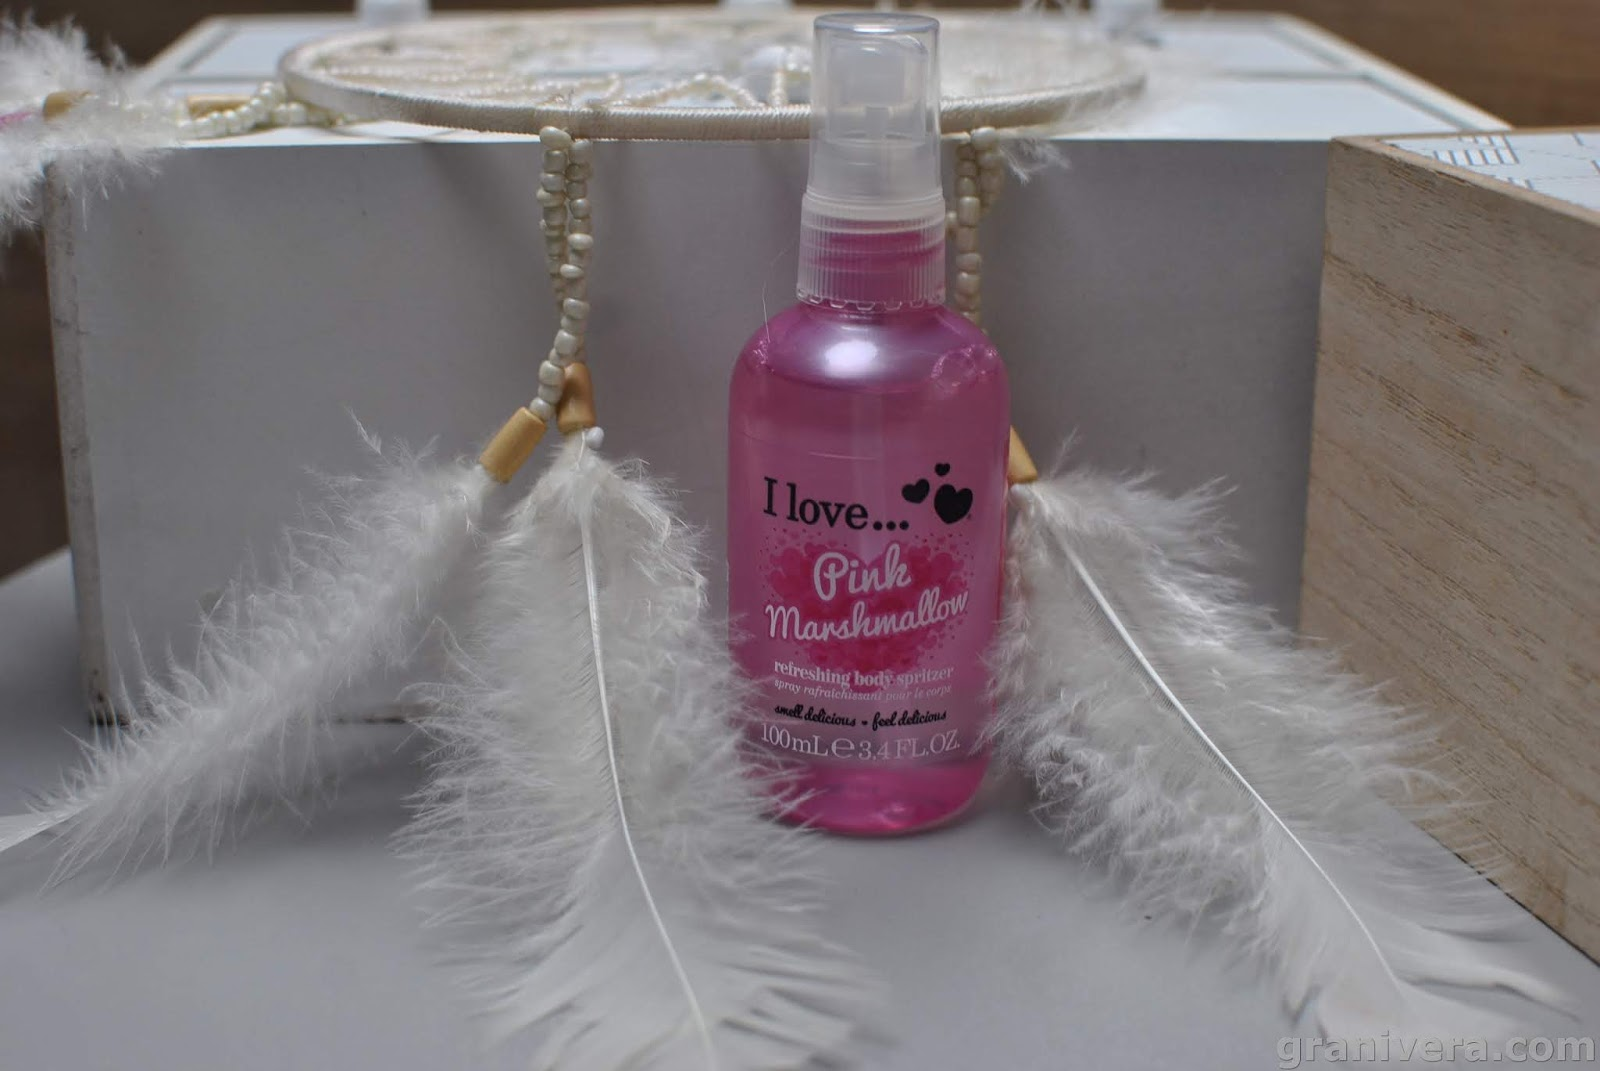 I love... Cosmetics ILOVEBOX